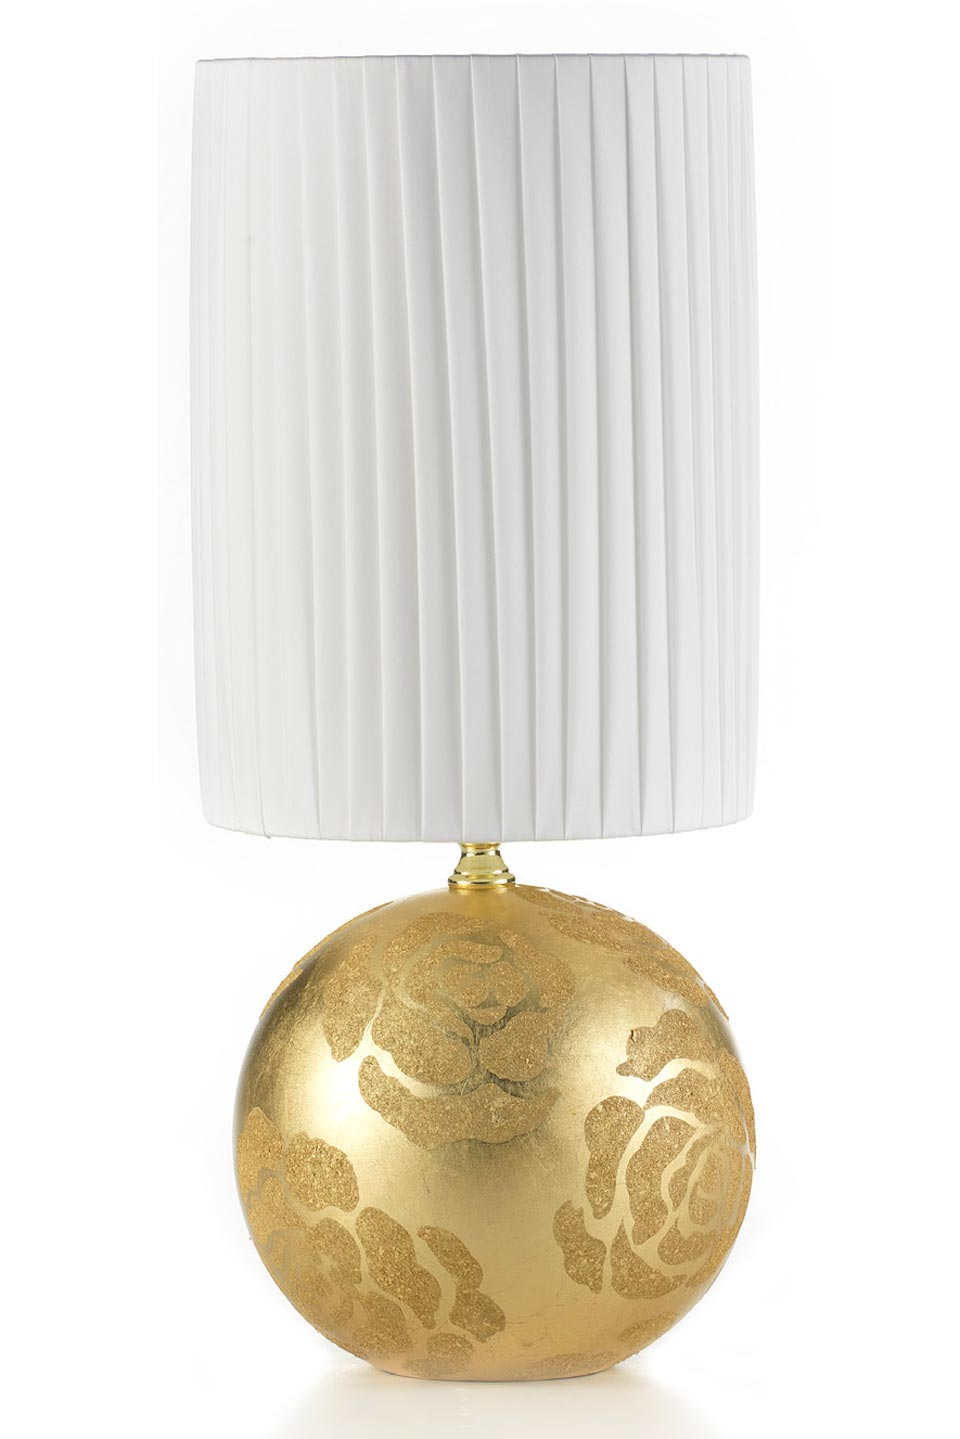 Linea Globe lampe ronde dorée motif fleurs petit modèle. Munari par Stylnove Ceramiche.